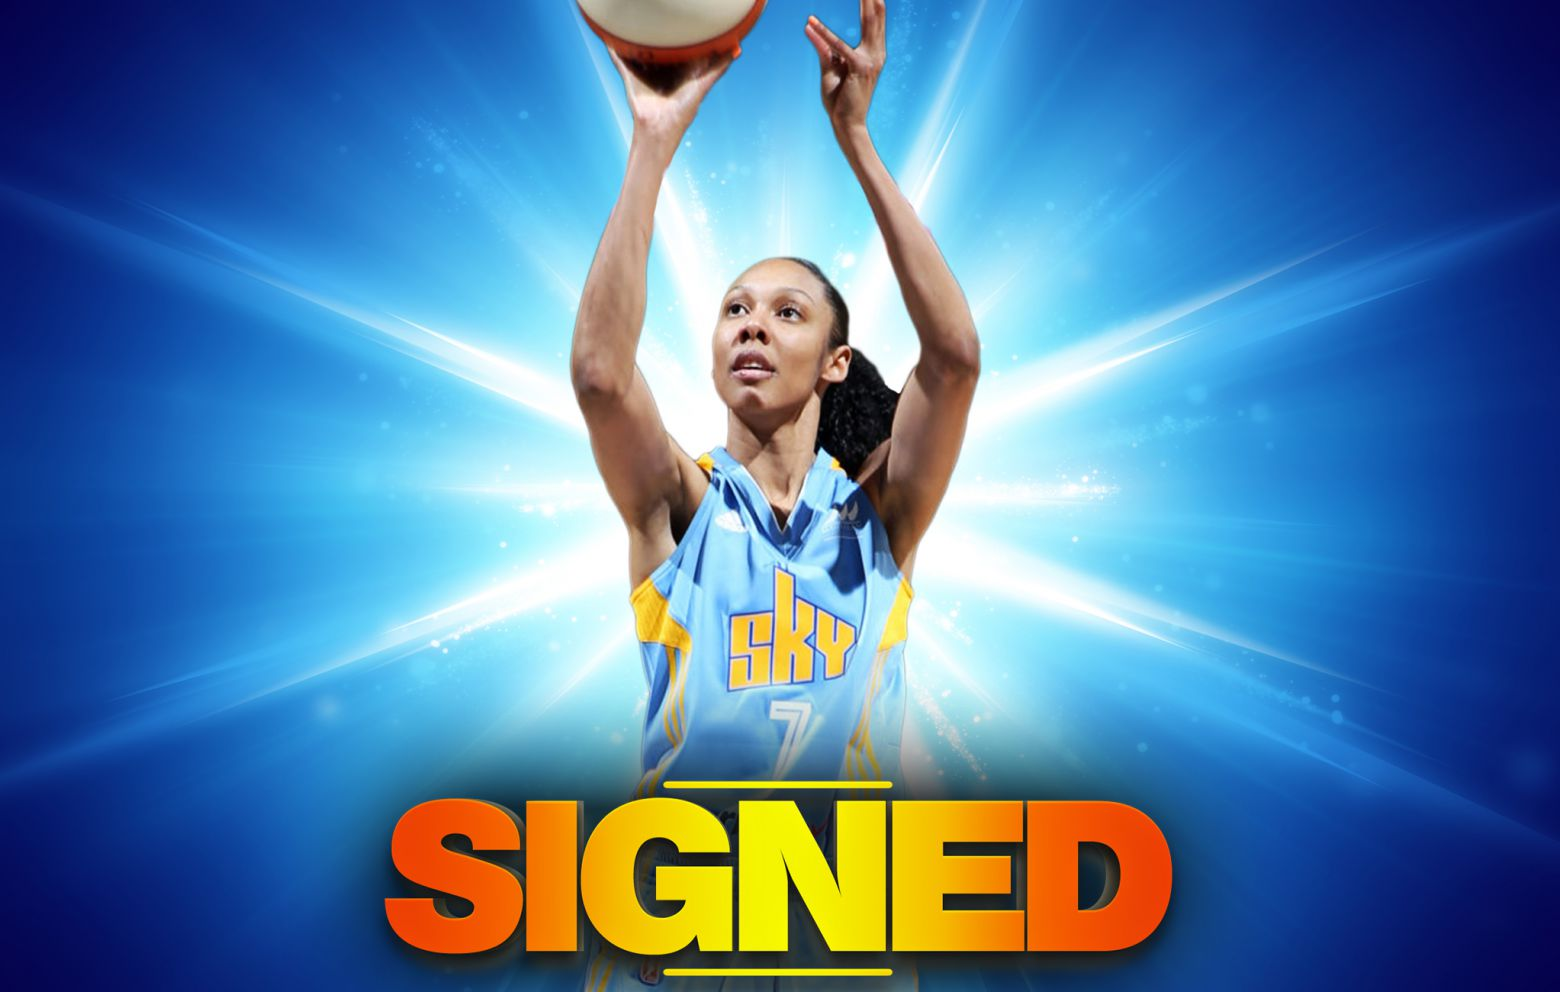 REBEKAH GARDNER ha firmado con Regeneracom Sports